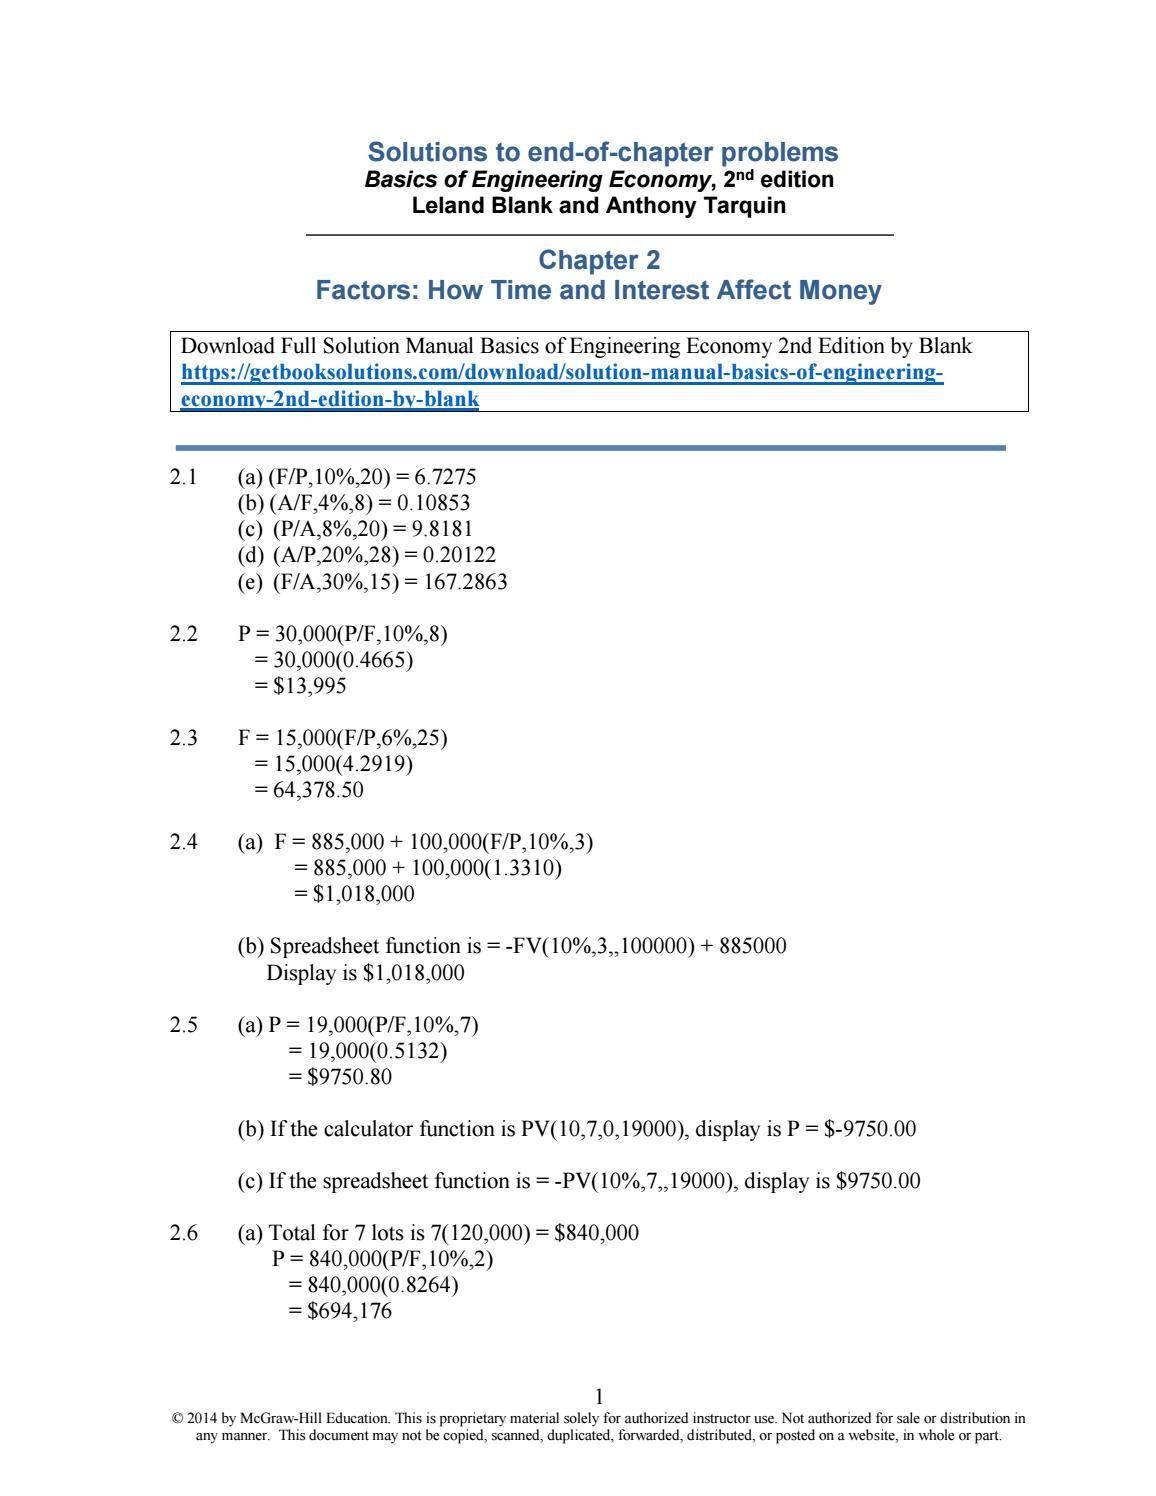 Solution manual basics of engineering economy 2nd edition